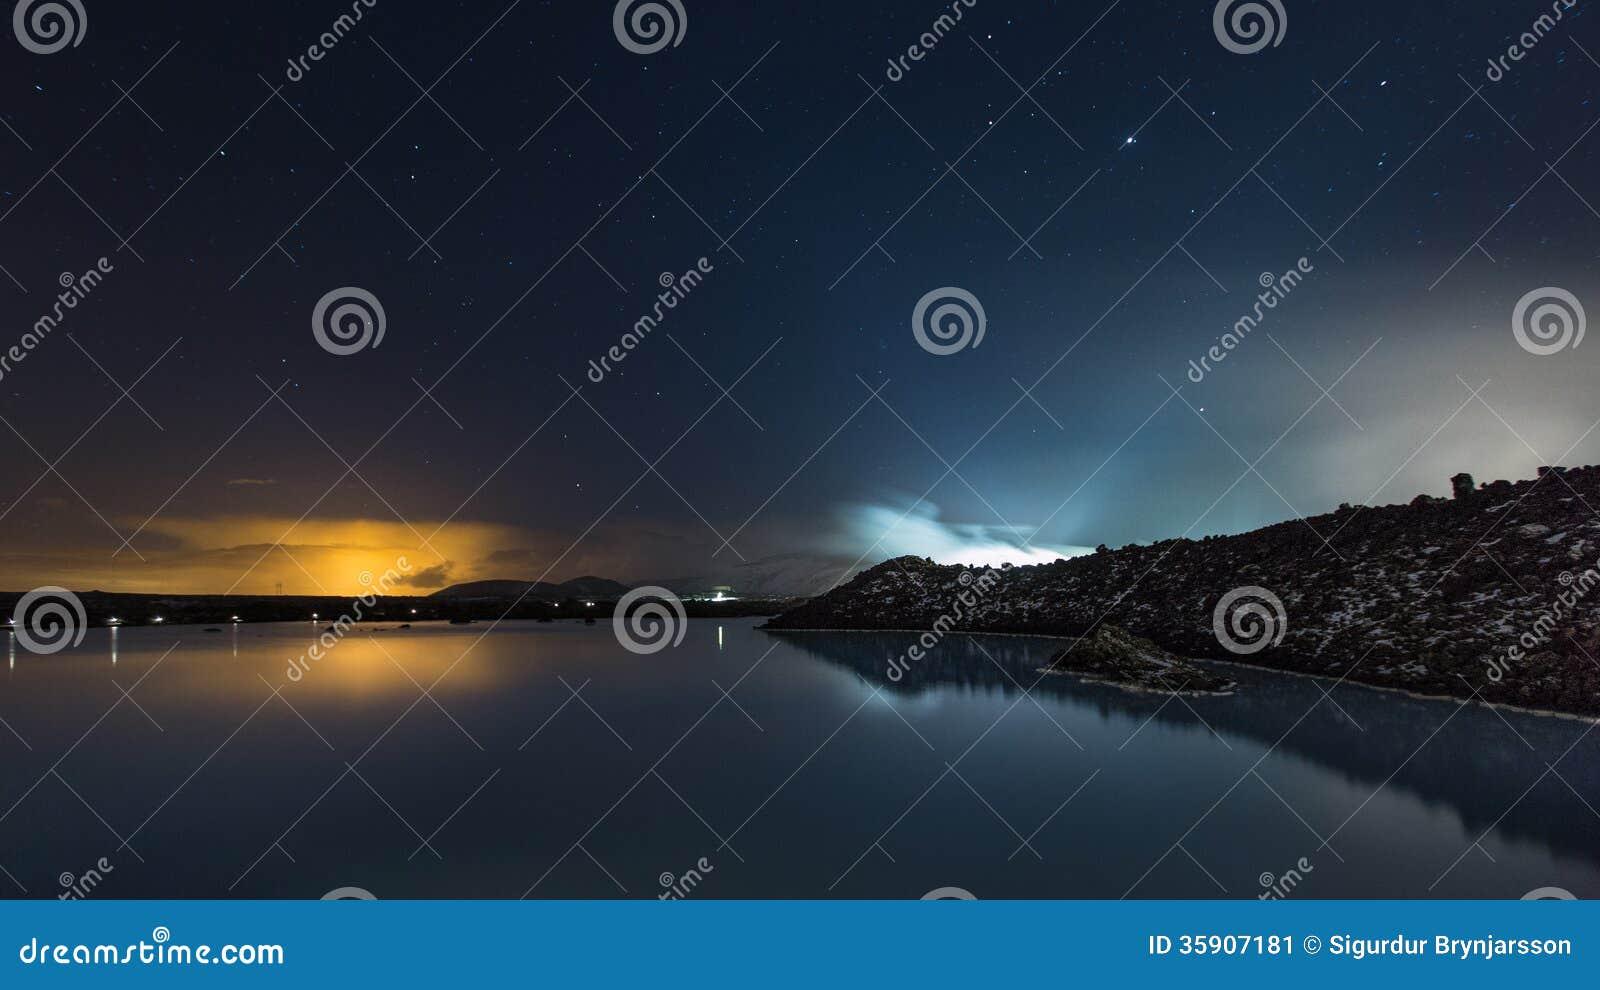 The Blue Lagoon on a calm night